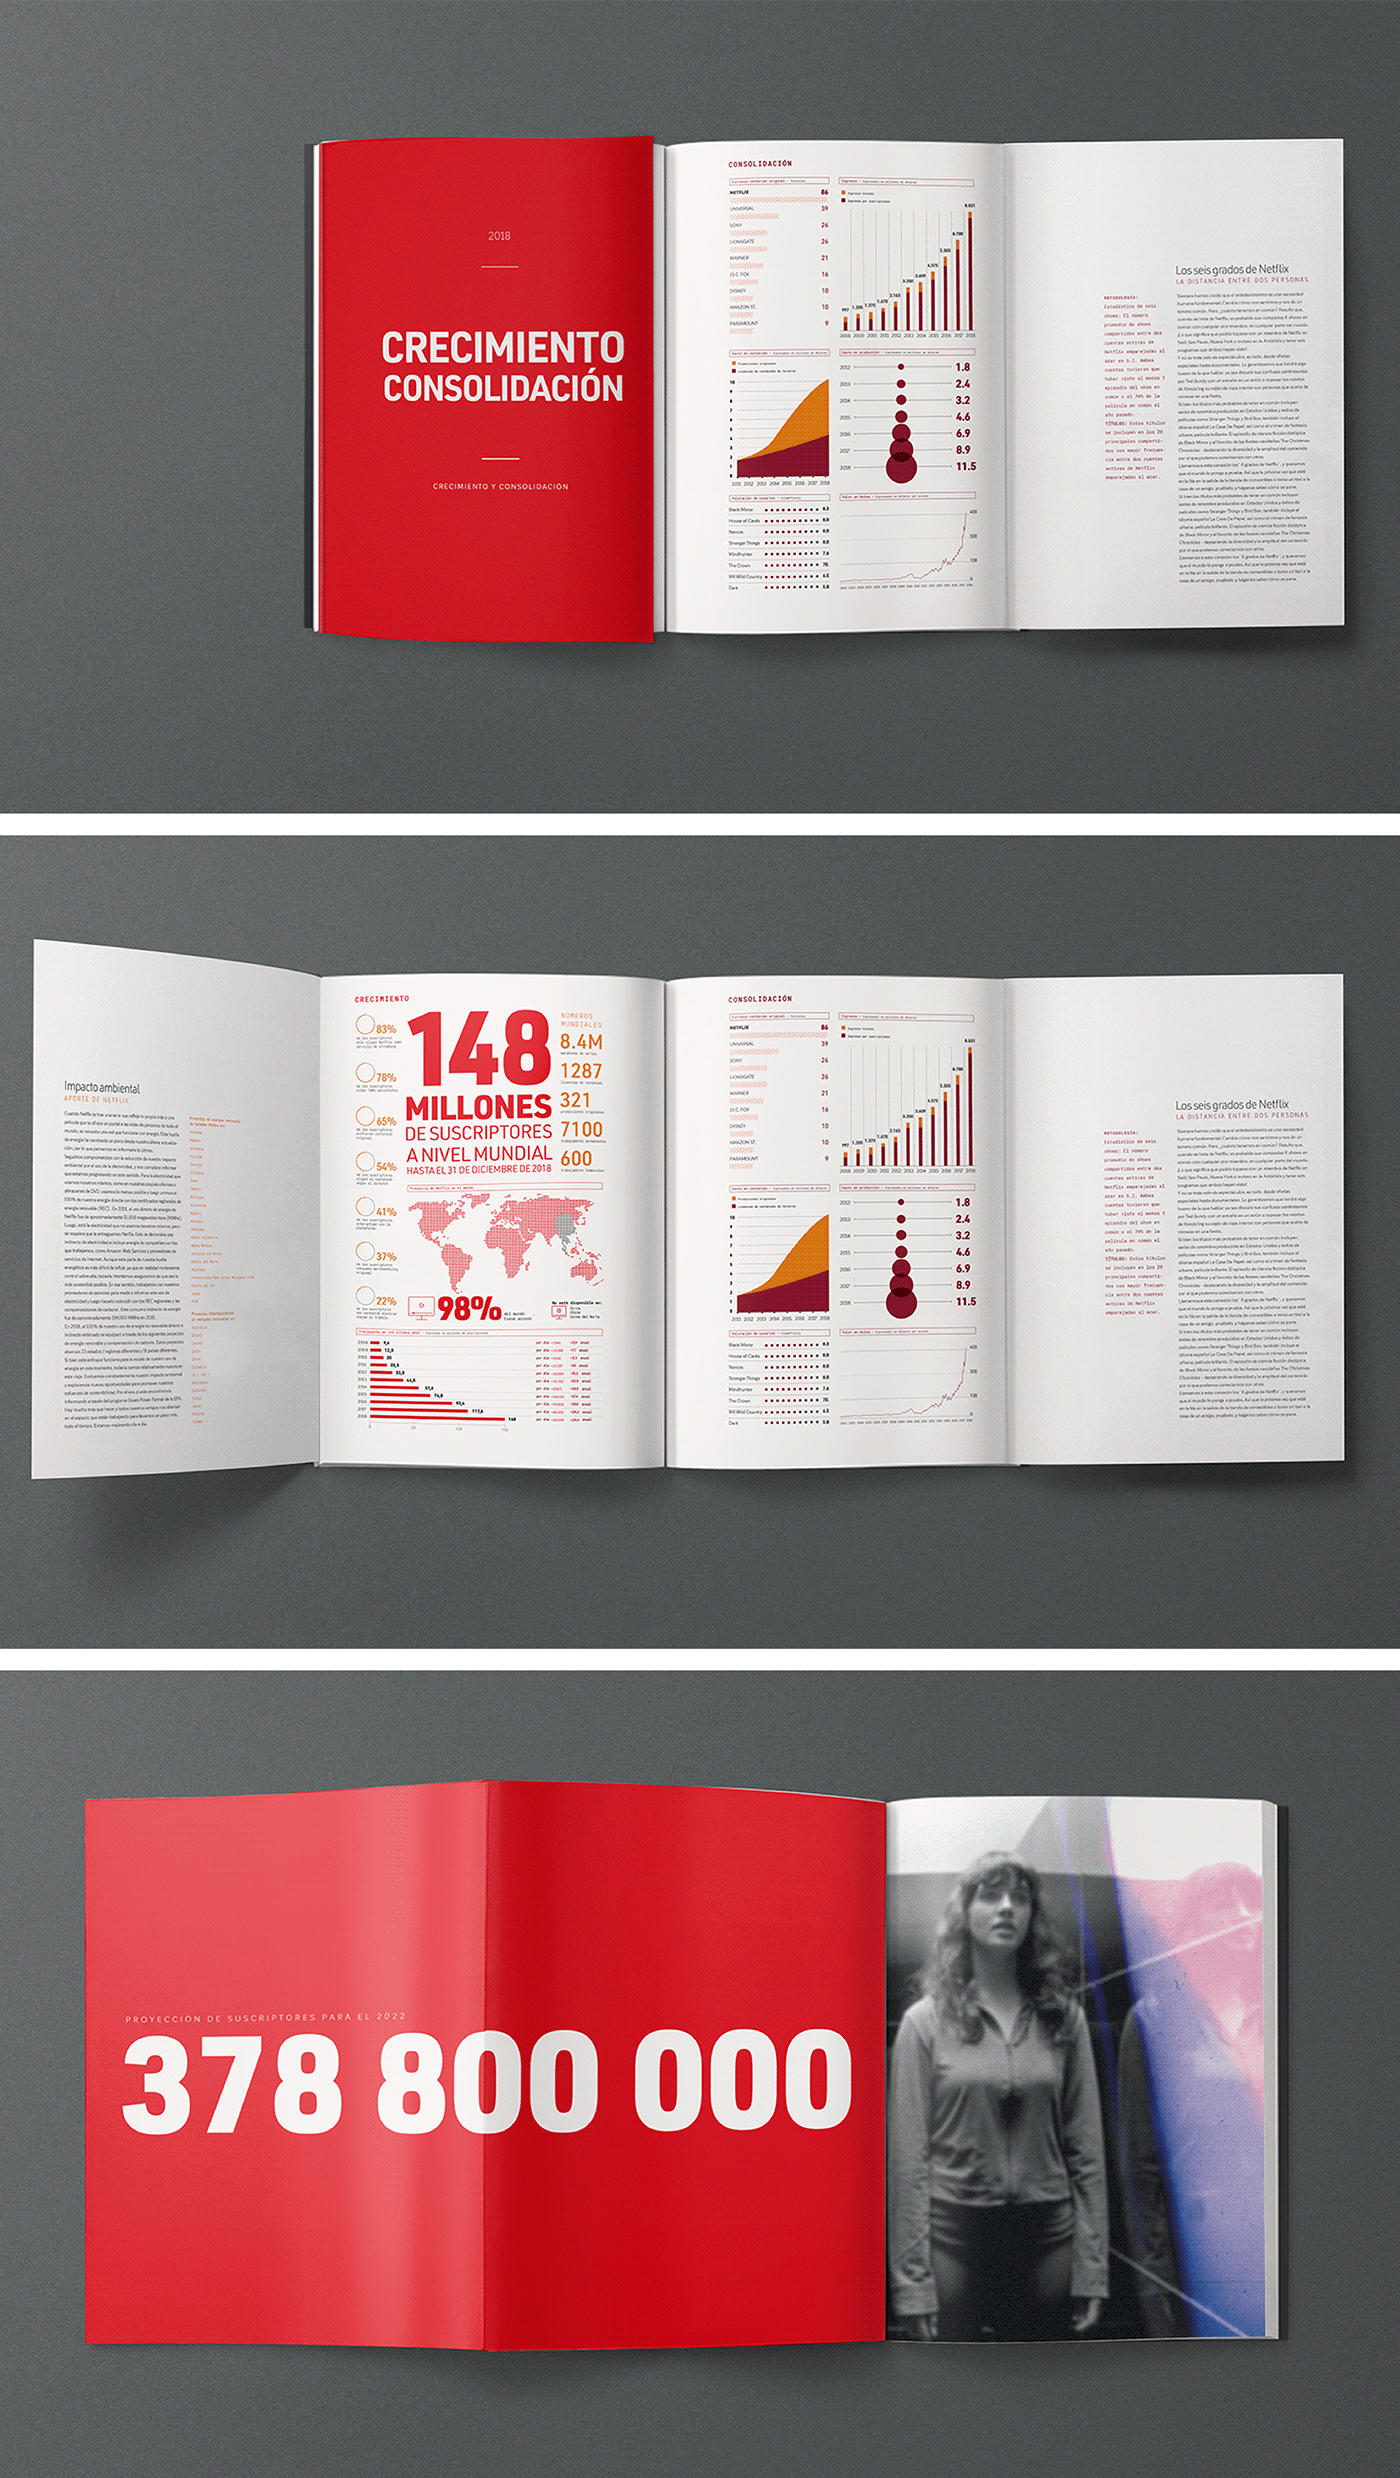 Annual Report Netflix On Behance Annual Report Nonprofit Annual Report Design Graphic Design Resume